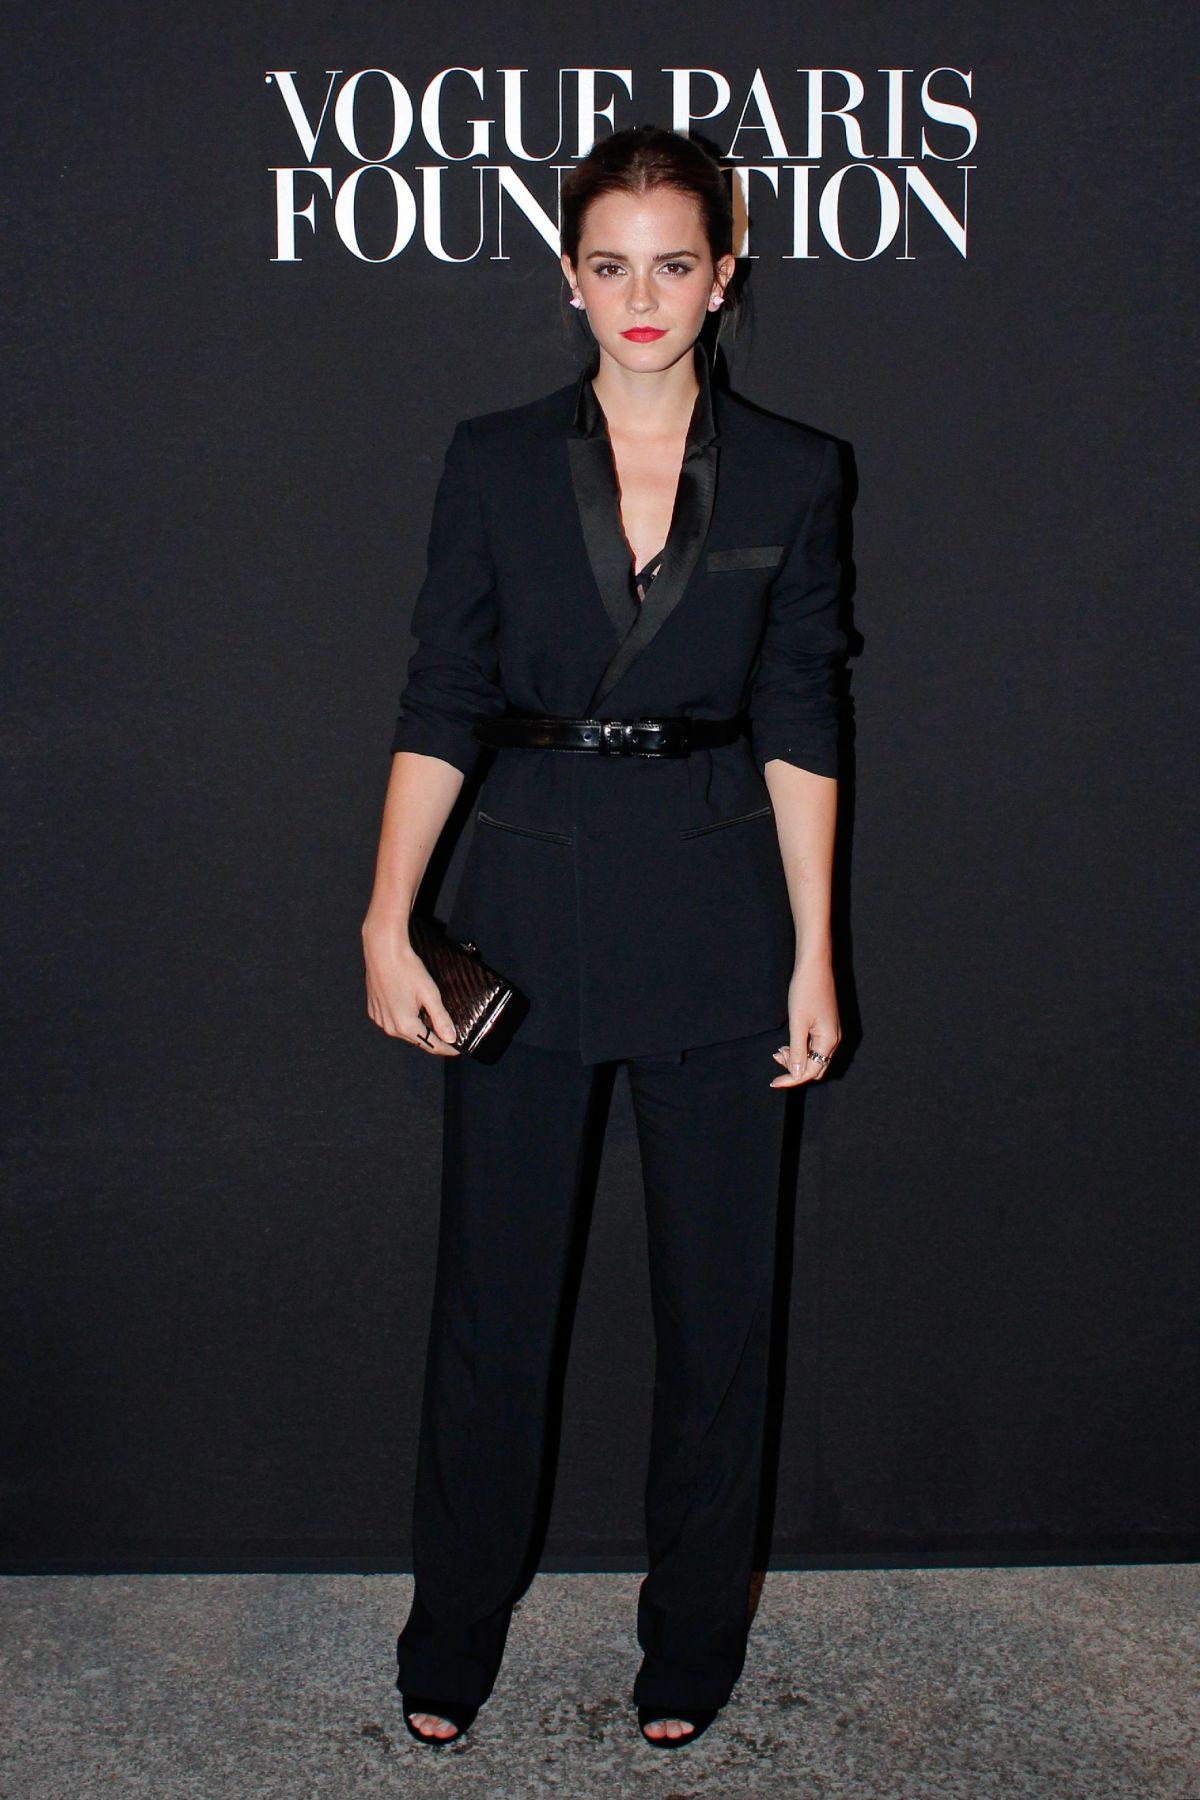 EMMA WATSON at Vogue Foundation Gala Dinner